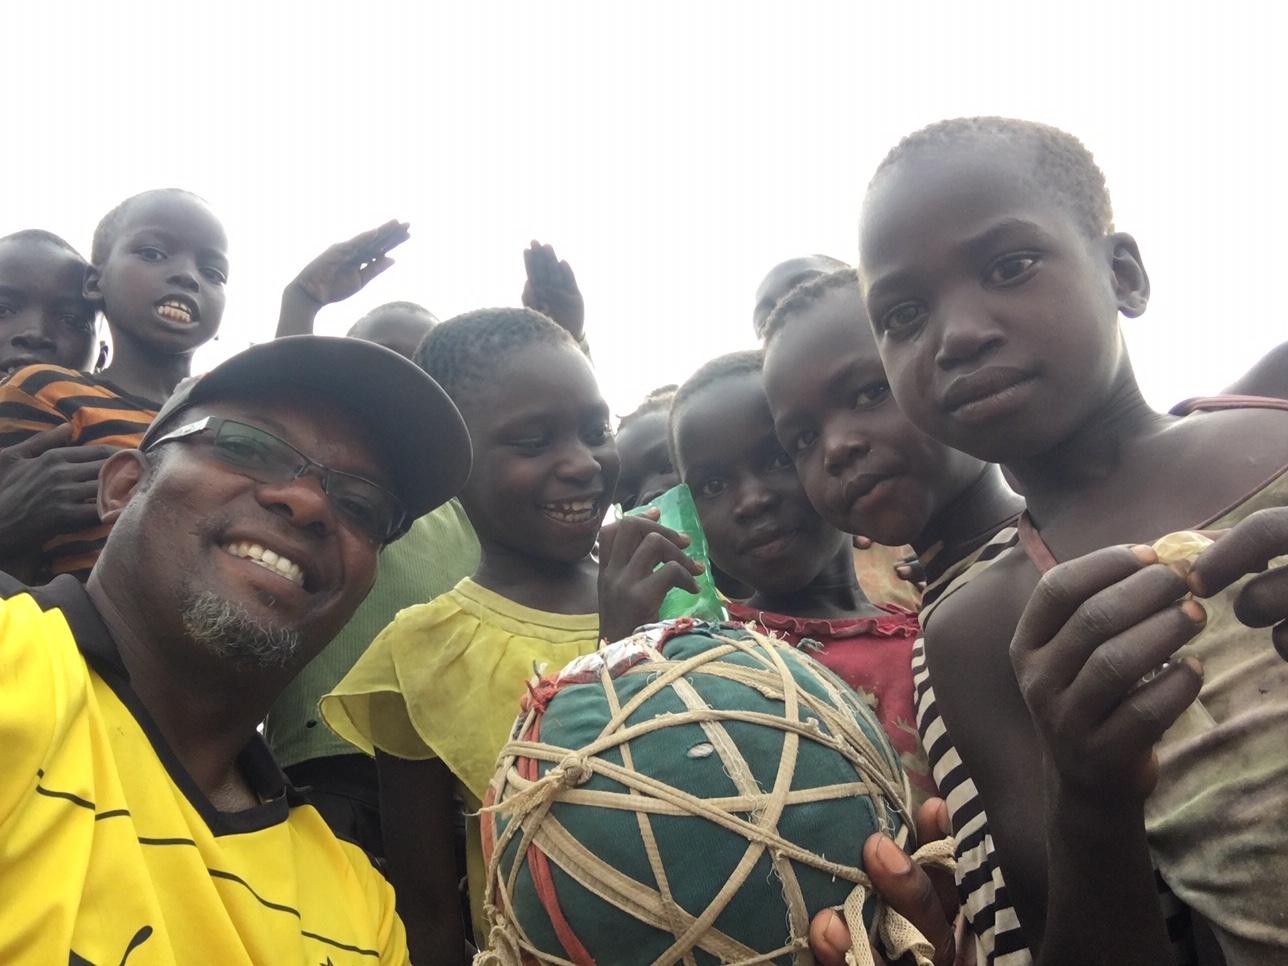 refugee camp bp uganda 2019.4